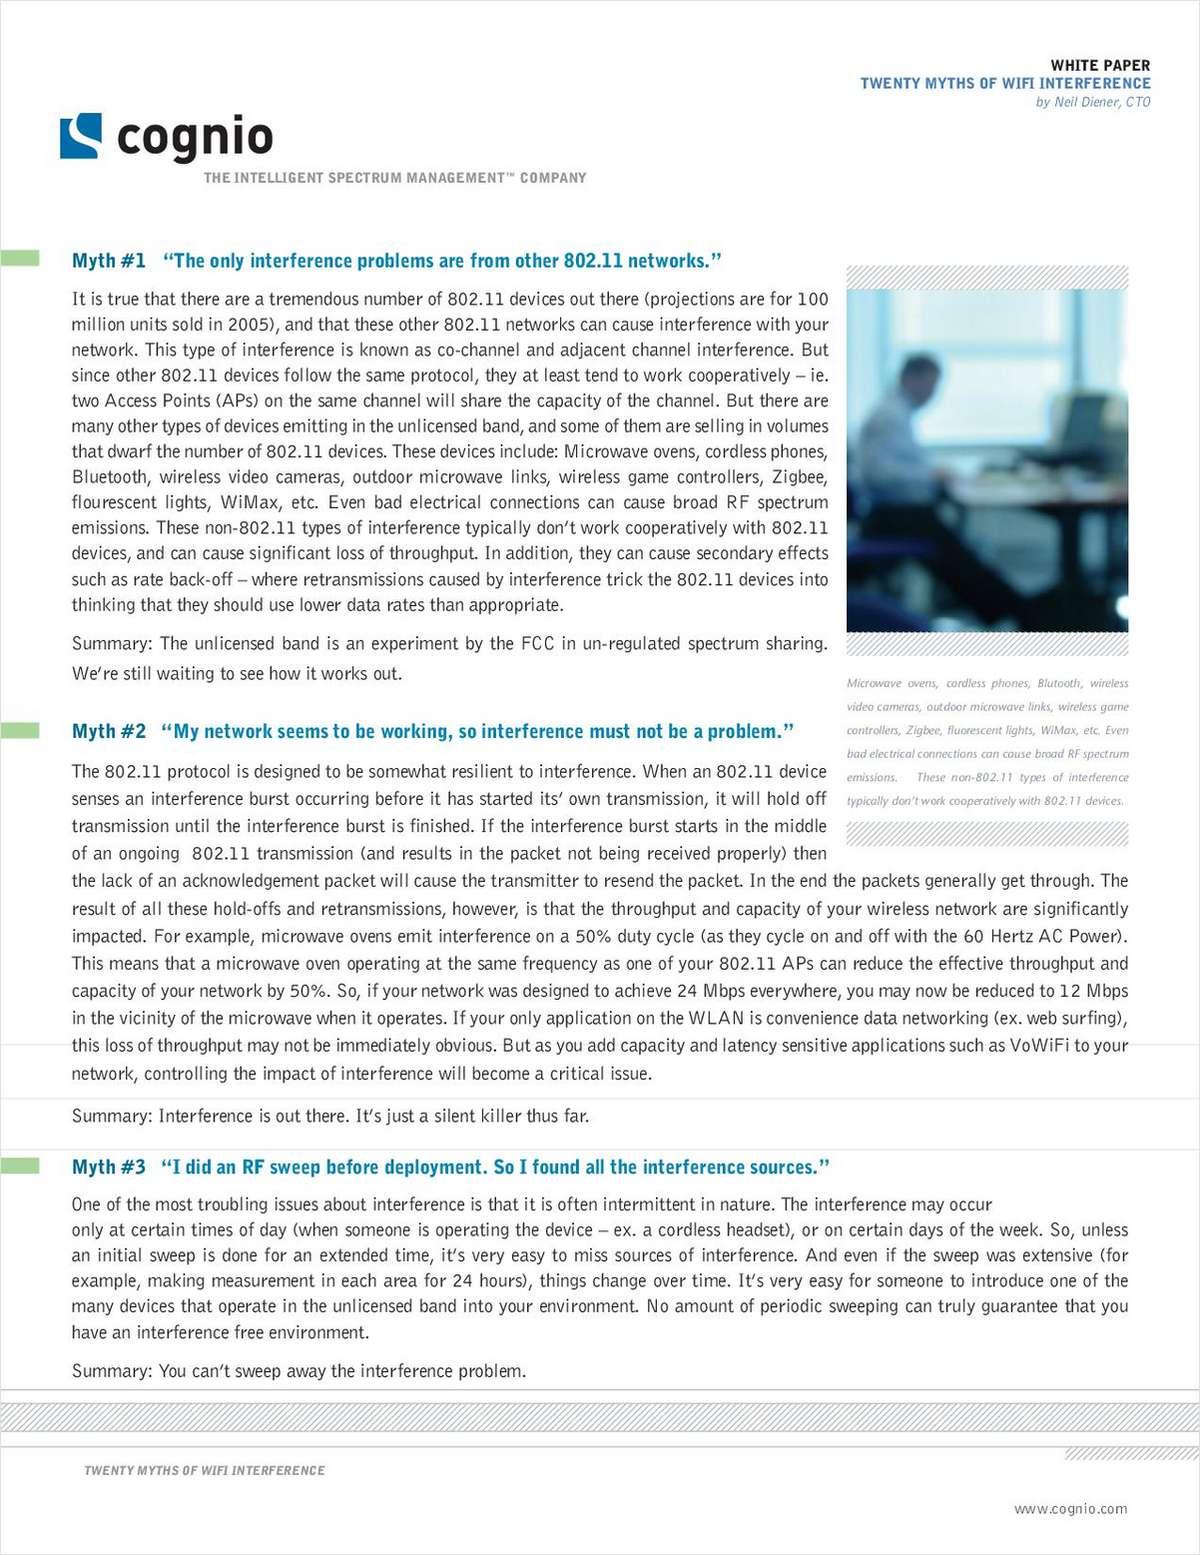 Twenty Myths of WiFi Interference